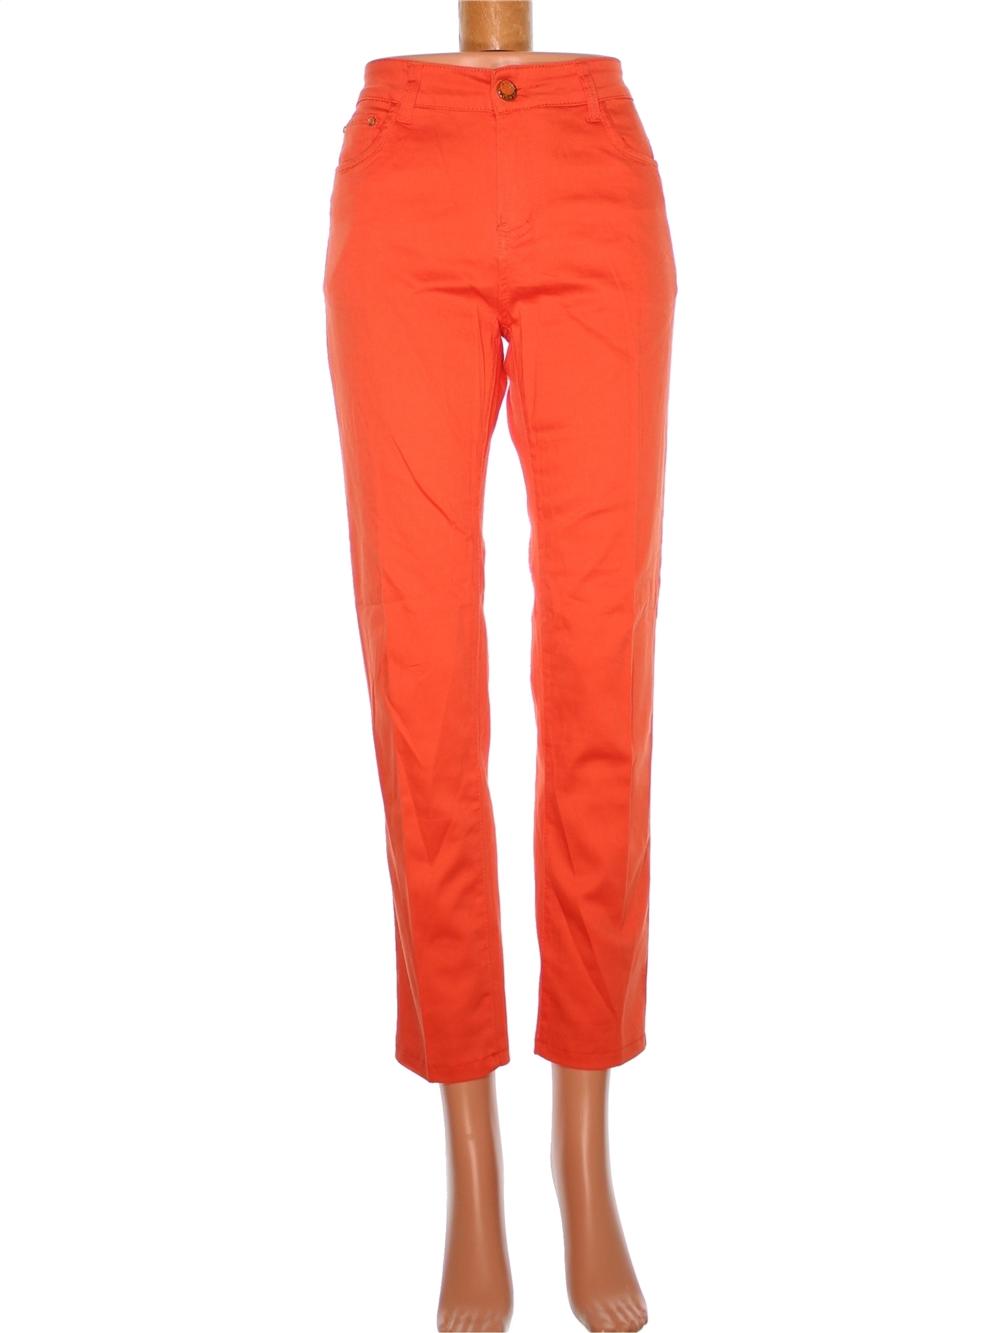 pantalon femme x max